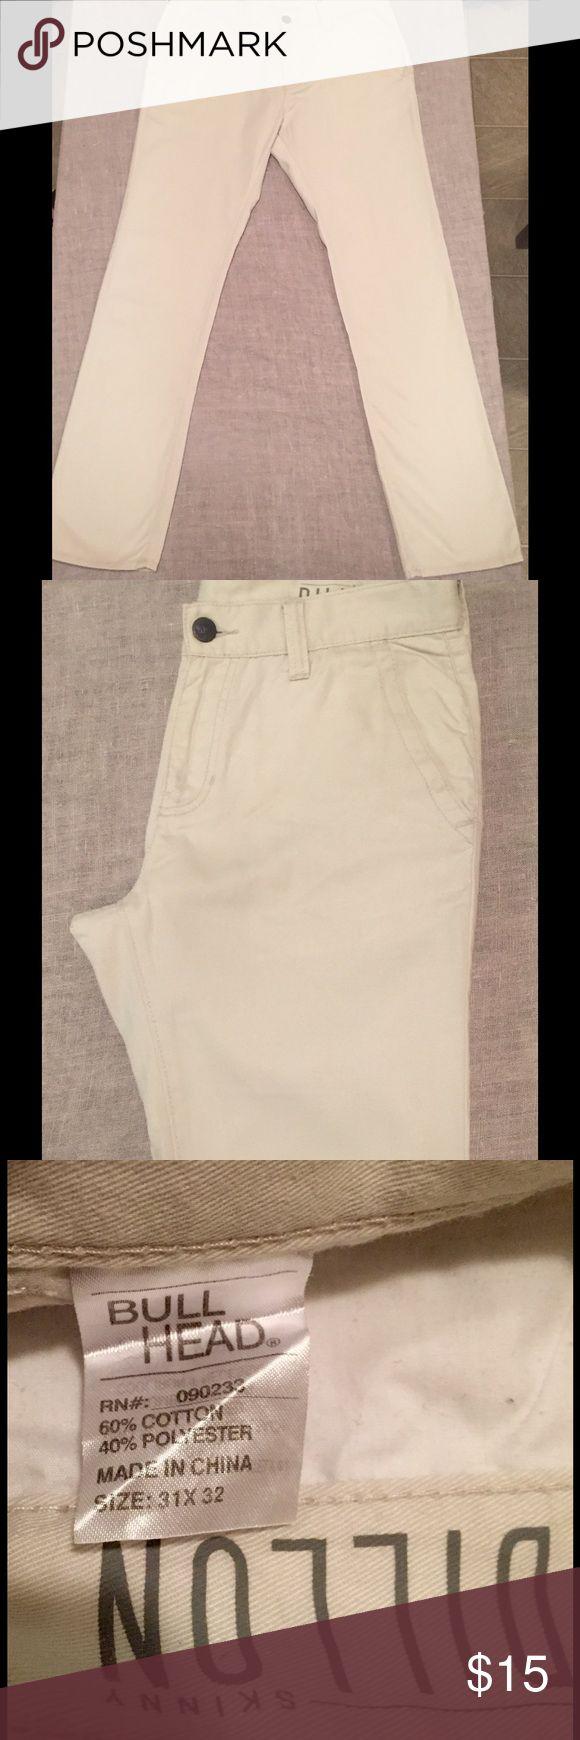 Bullhead Skinny Dillon White Pants 31x32 Great condition.  Bullhead Skinny Dillon White pants.  31x32.  Ships immediately! Bullhead Pants Chinos & Khakis